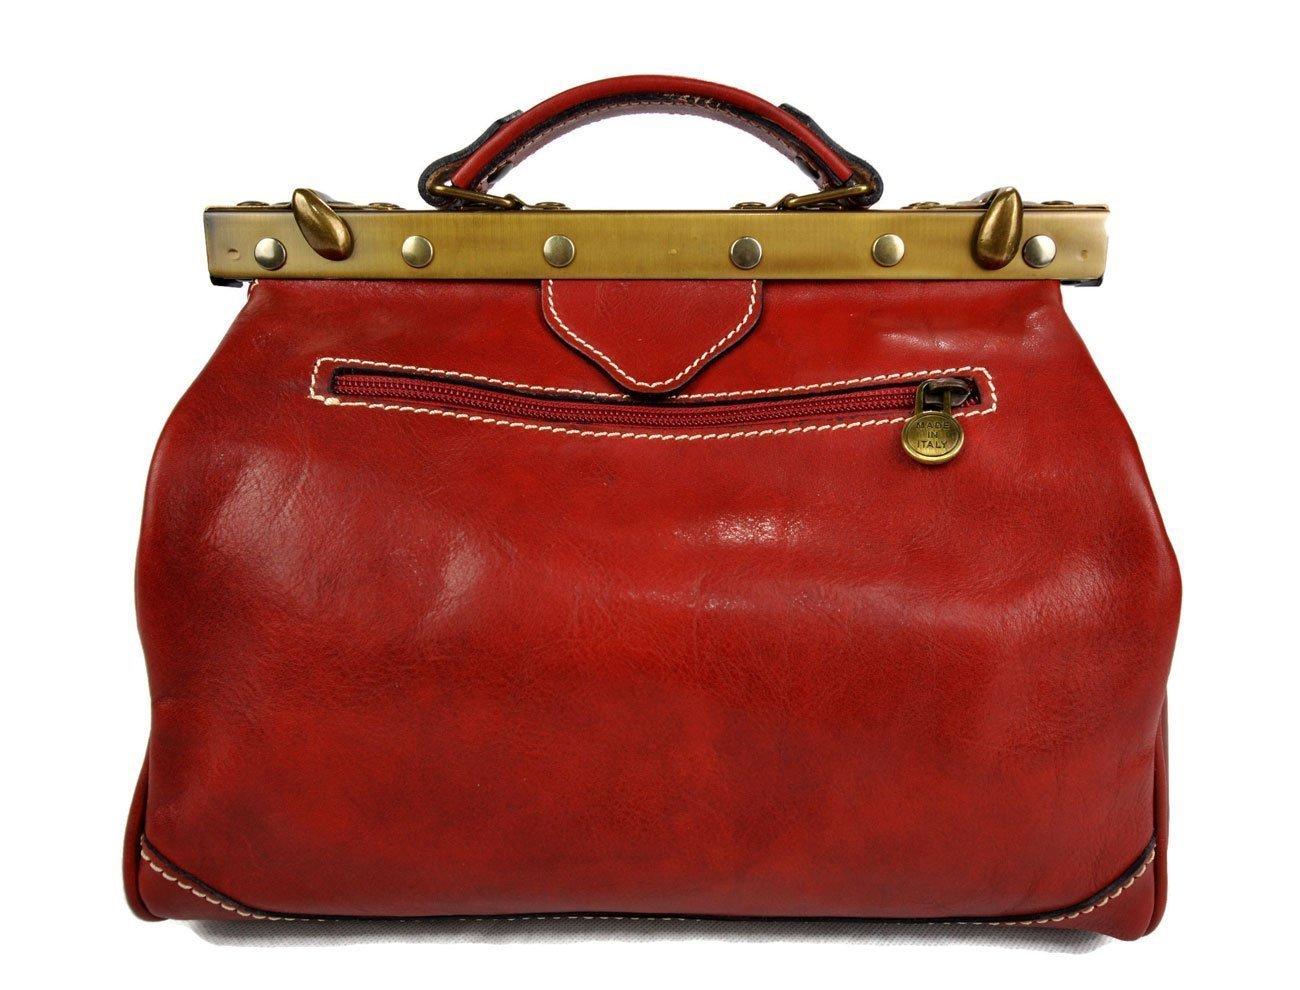 Ladies leather handbag doctor bag handheld shoulder bag medical purse red made in Italy - handmade-bags